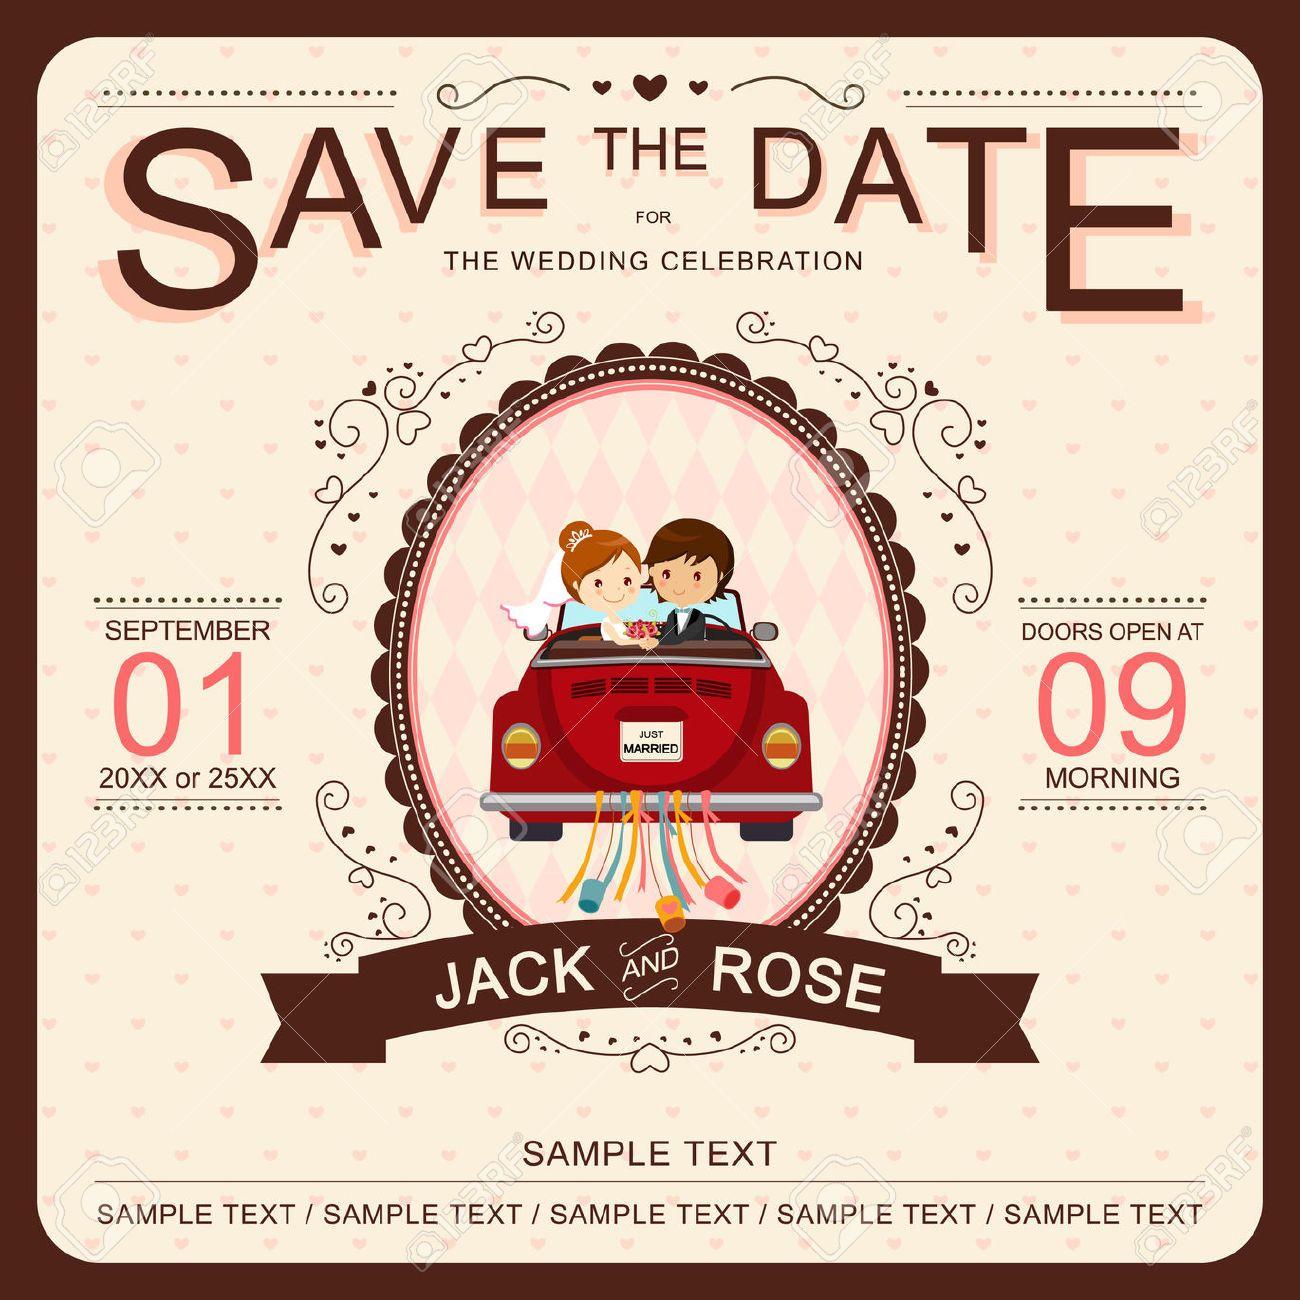 wedding invitation : Cute Bride and Groom in Red Car Wedding ...